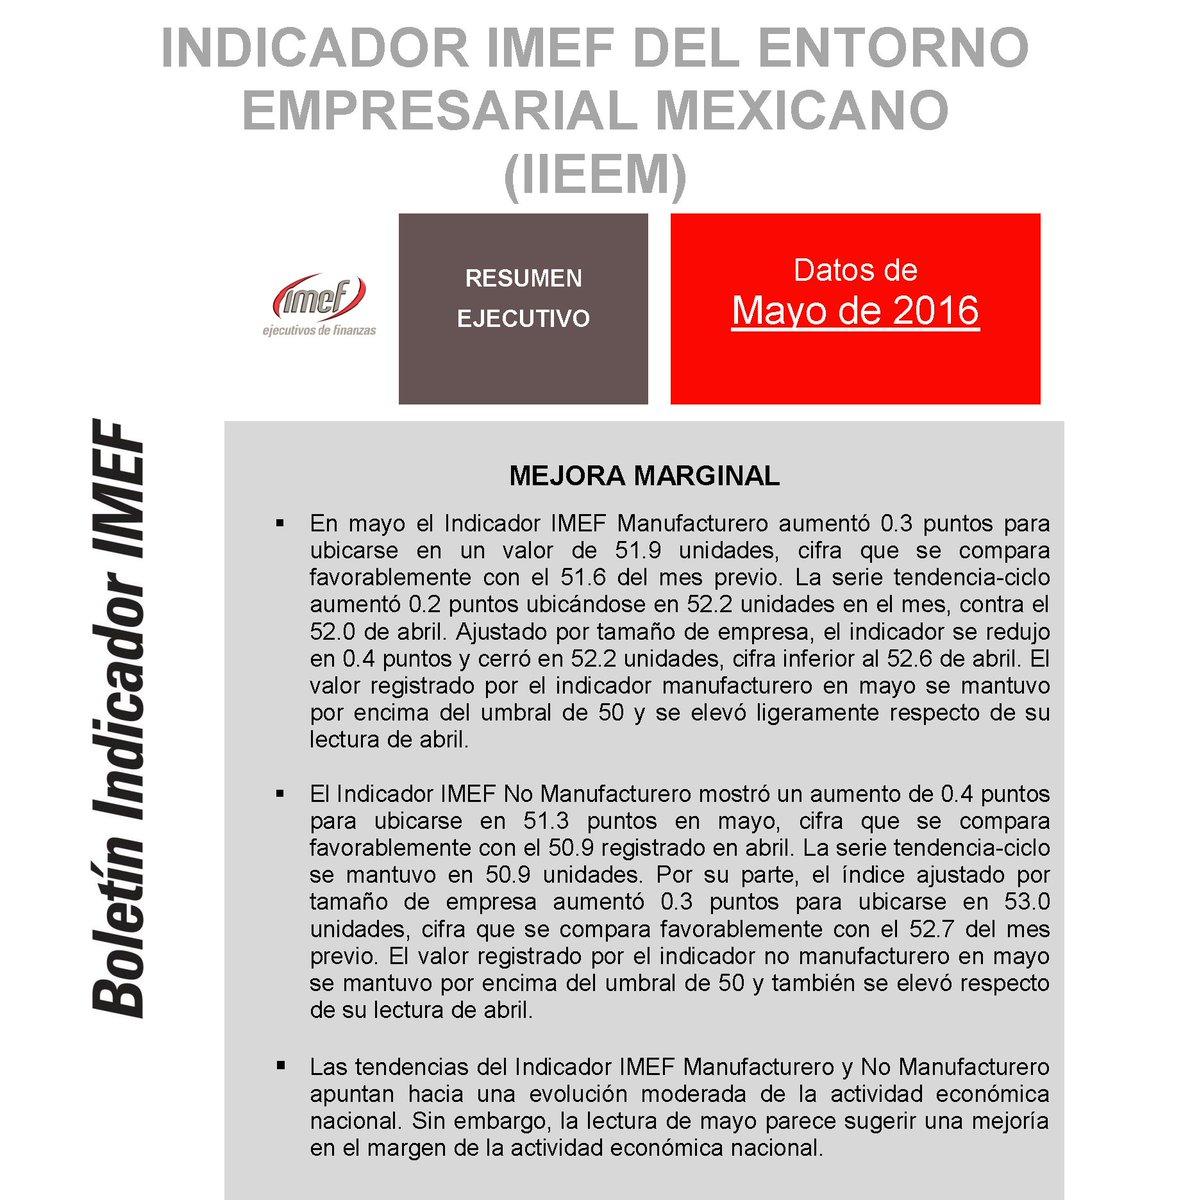 """Mejora marginal"", resultados del #IndicadorIMEF en mayo: https://t.co/mLO4G75PZP https://t.co/e27jHrLnQc"